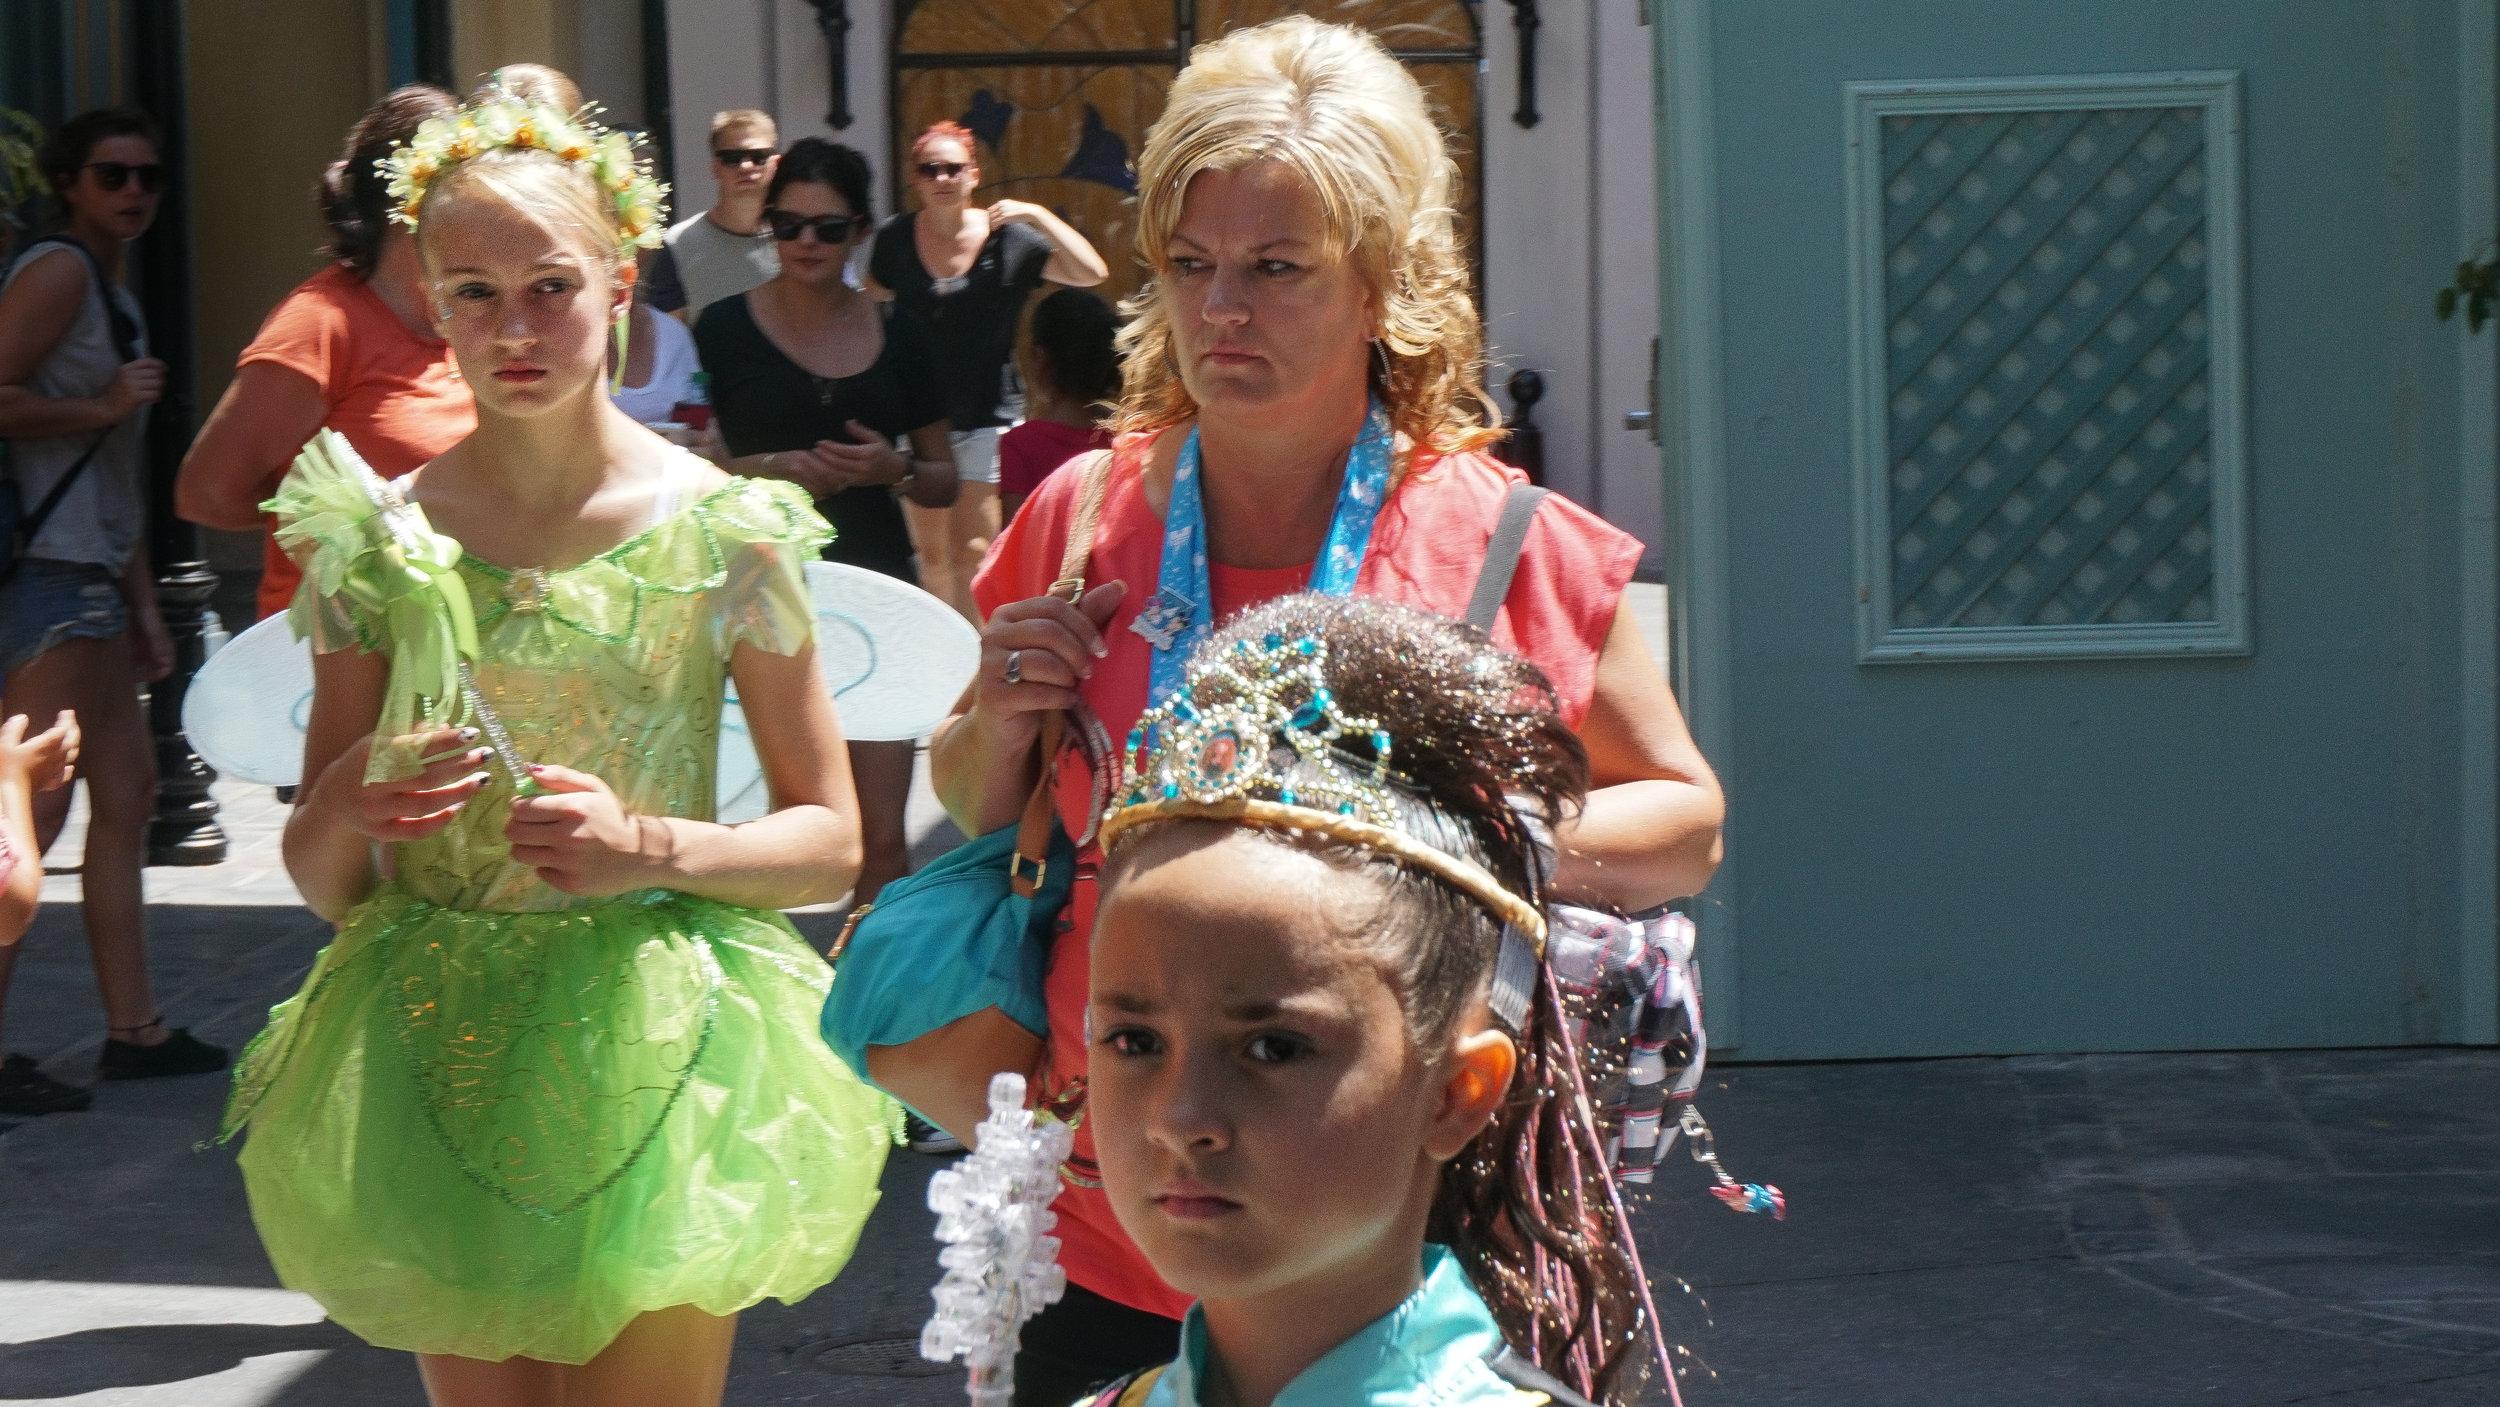 Disney-girls-1c-03841.jpg